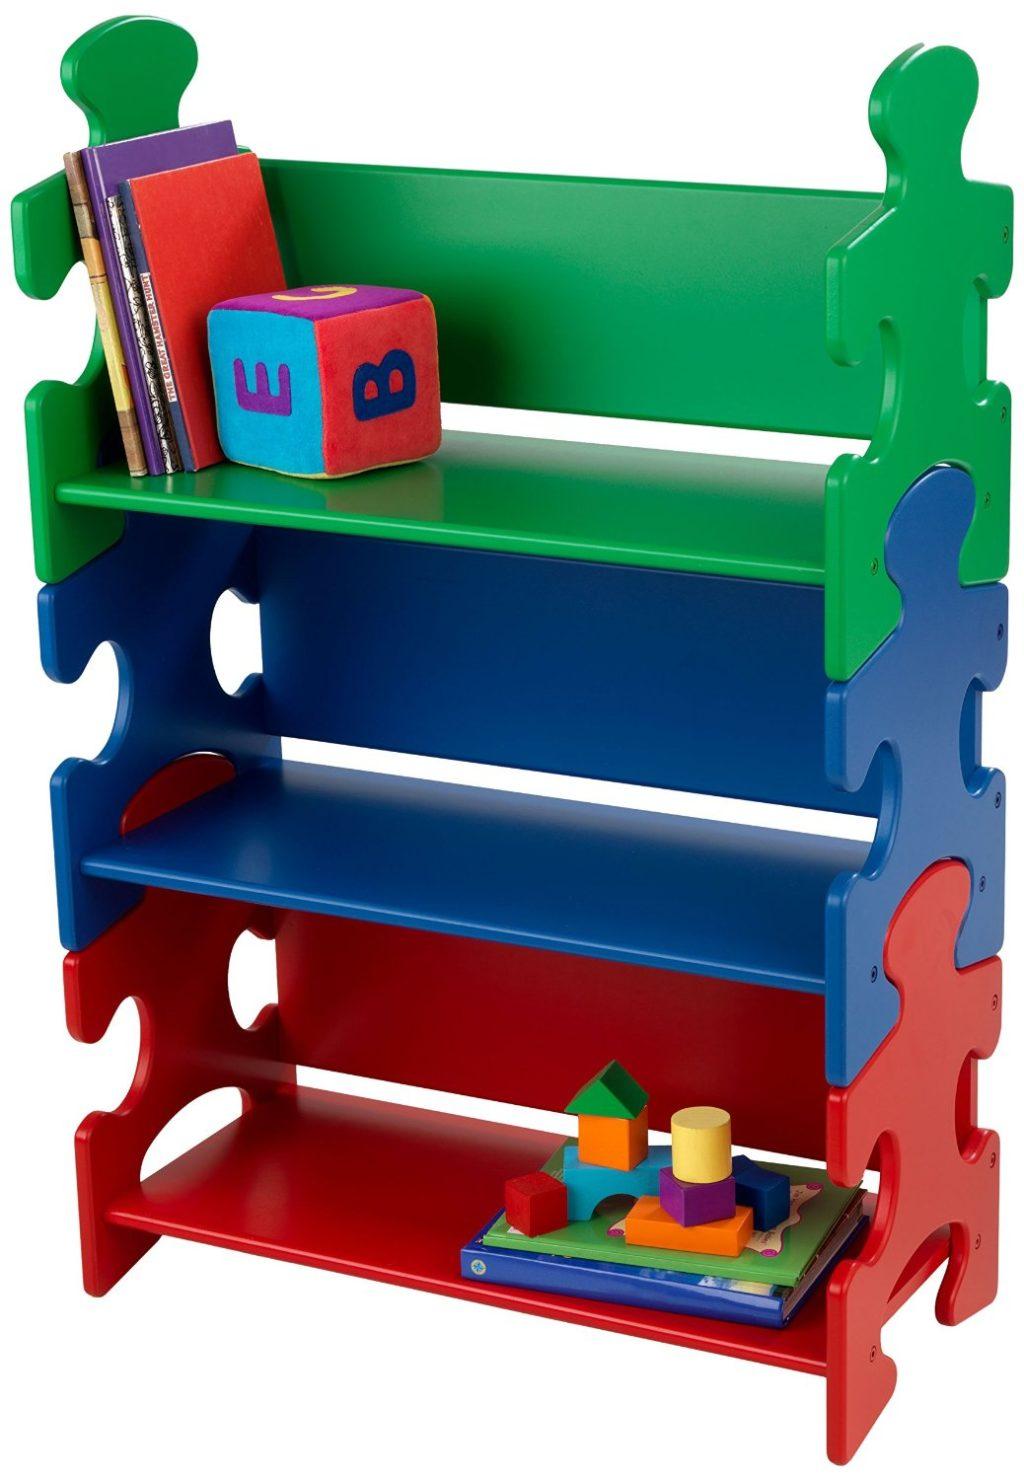 Book Rack For Kids Room